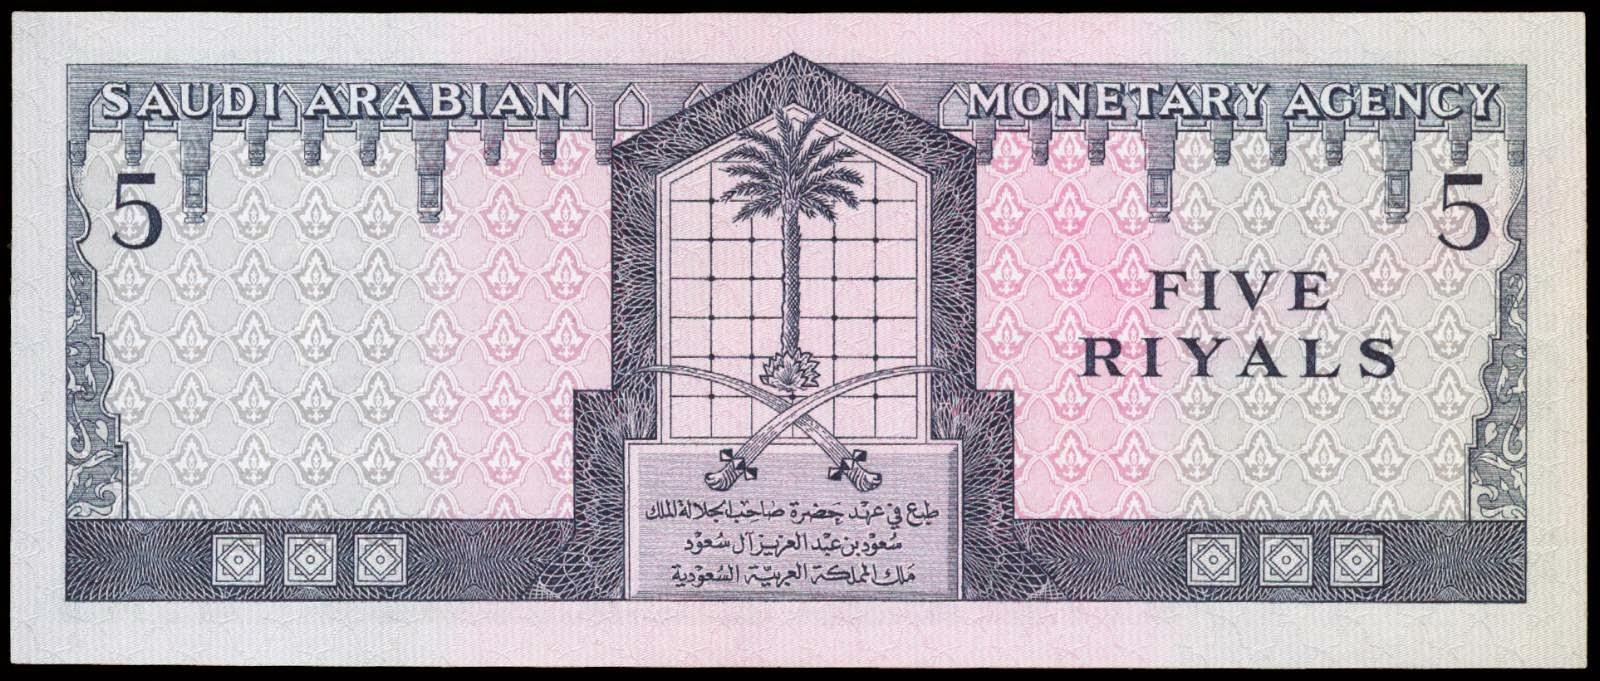 Saudi Arabia money currency 5 Riyals banknote 1961